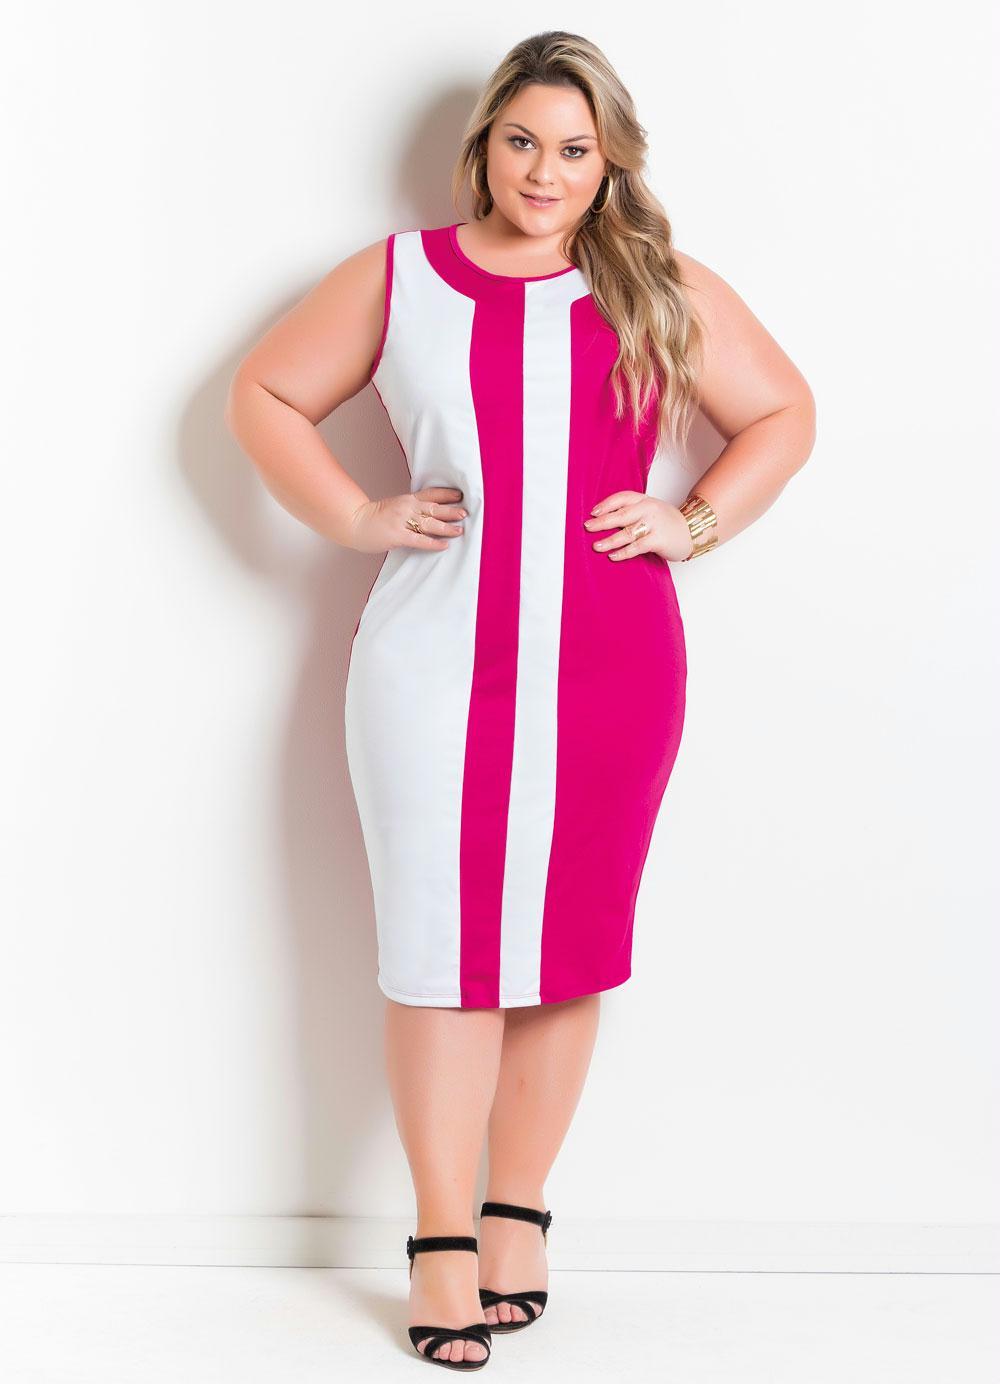 Vestido Bicolor Plus Size Púrpura e Branco - Marguerite cf366b4b538